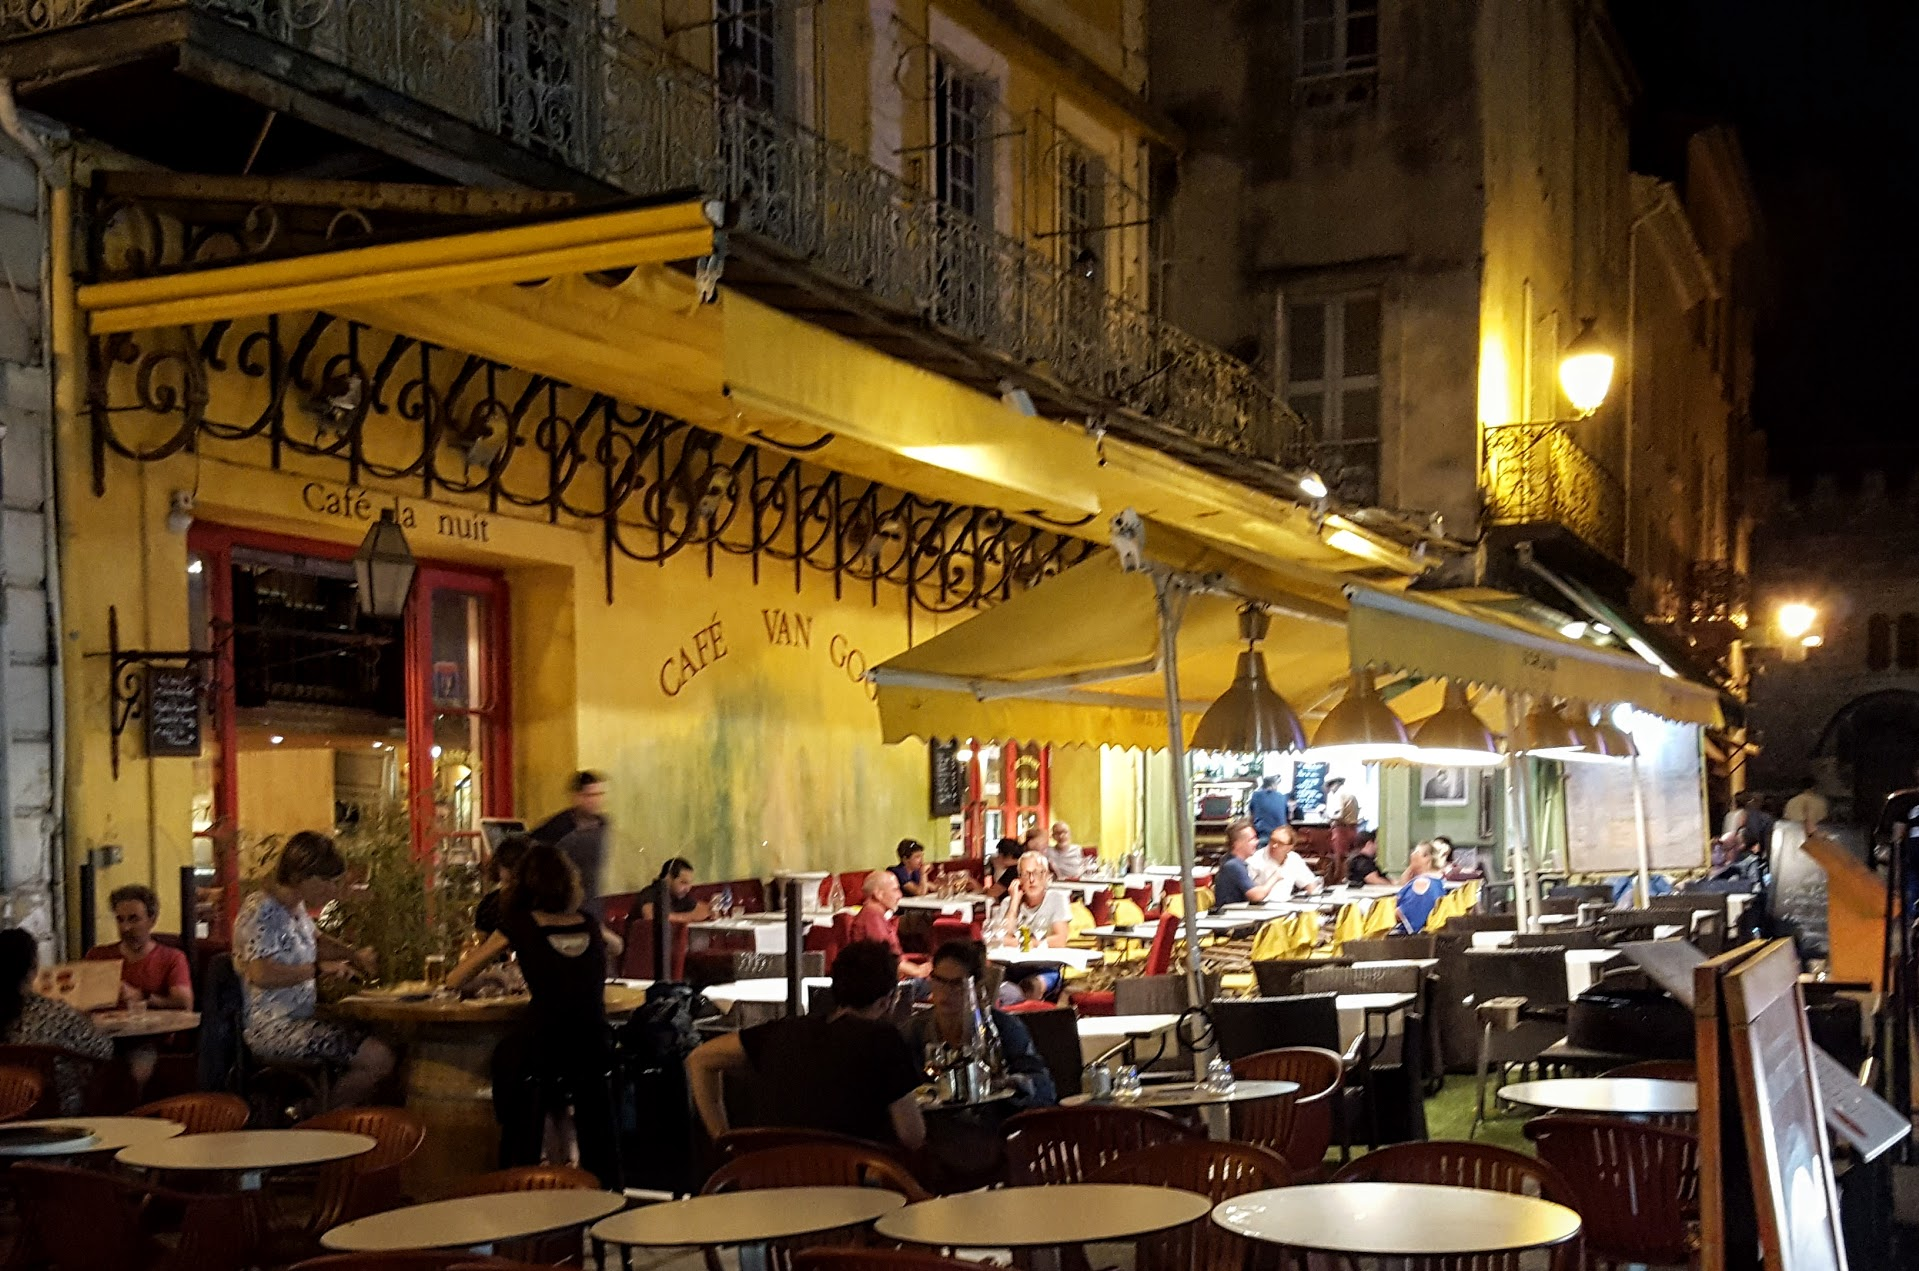 Cafe Van Gogh, Arles France, 2016